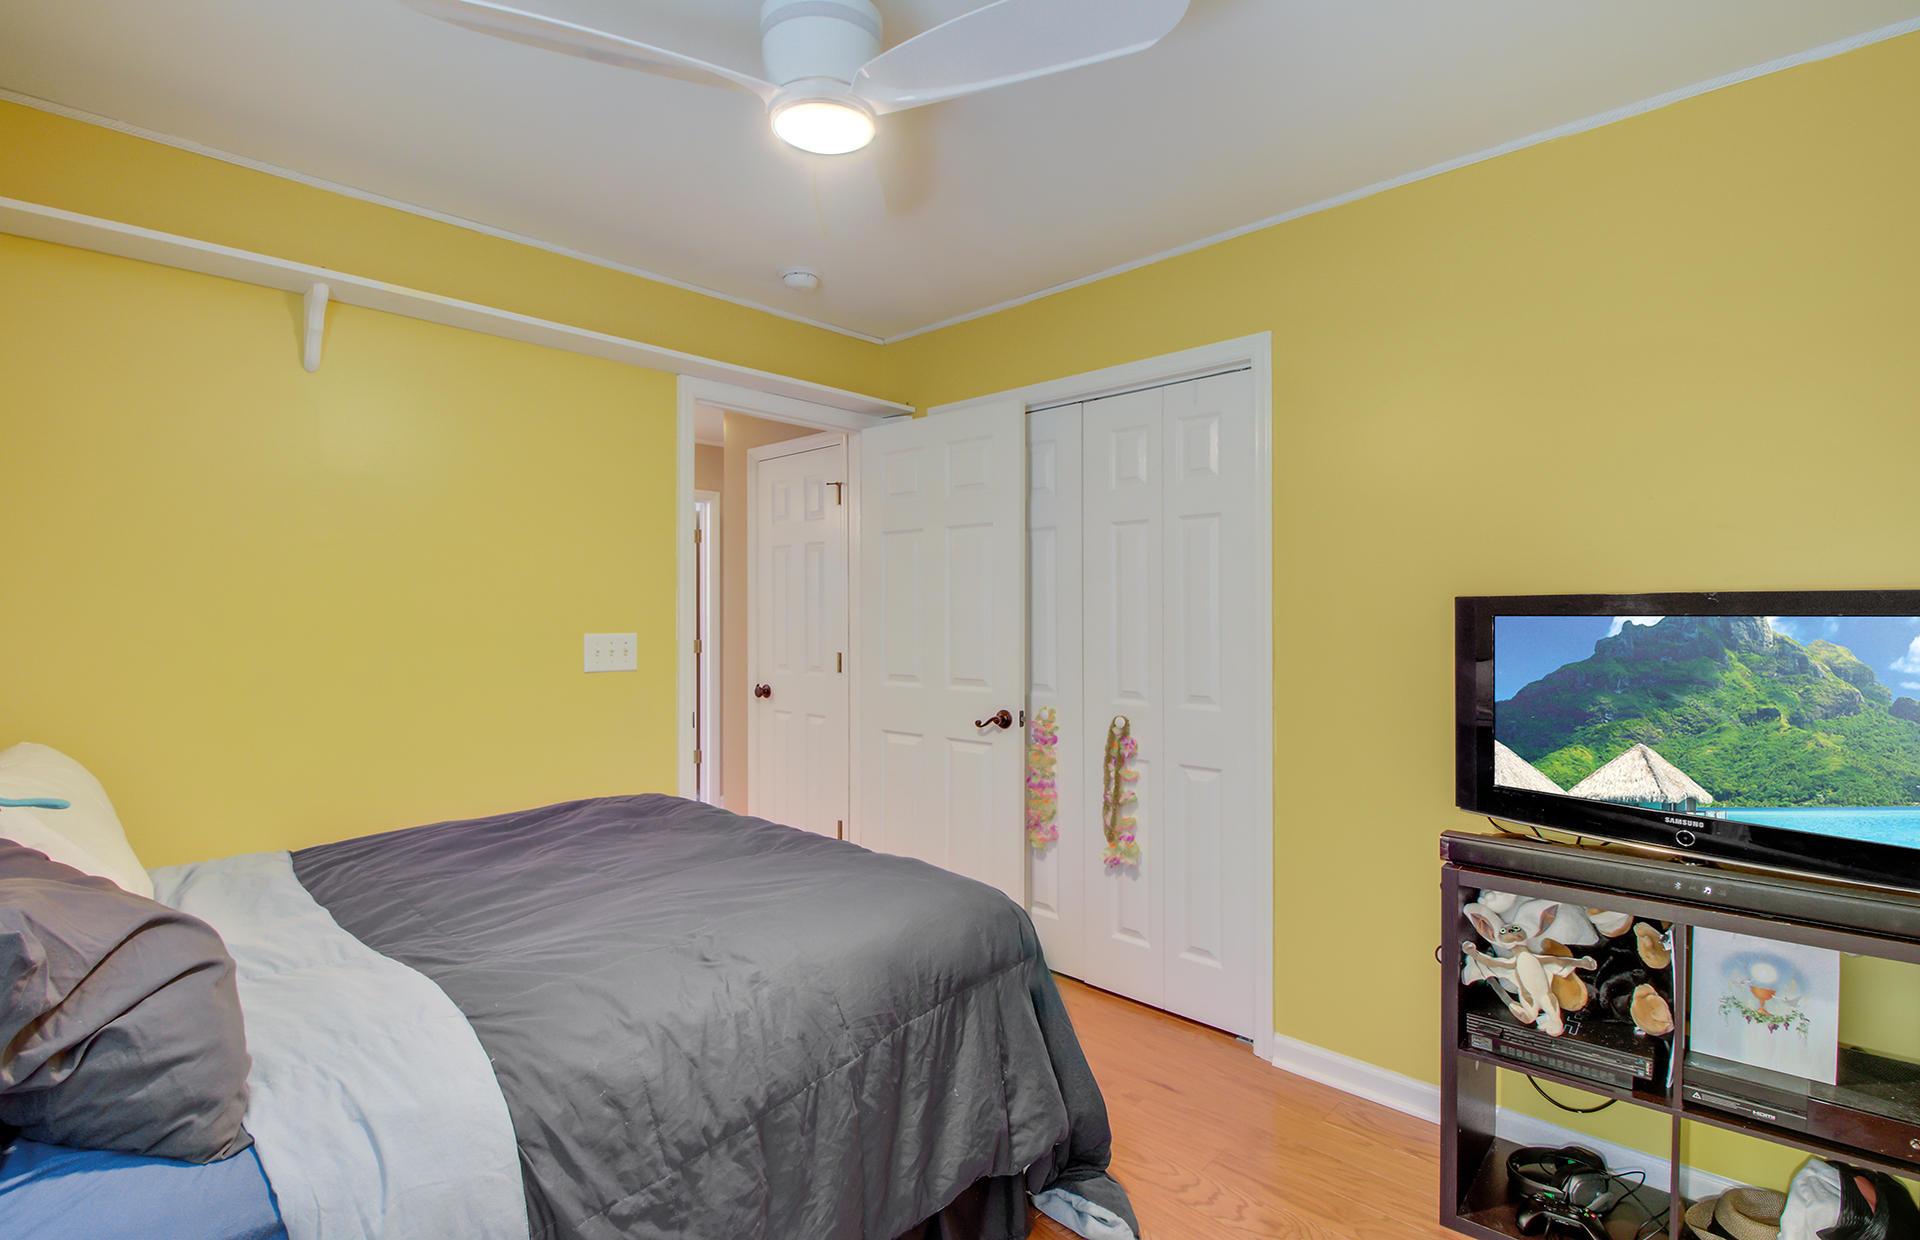 Park West Homes For Sale - 1500 Wellesley, Mount Pleasant, SC - 17